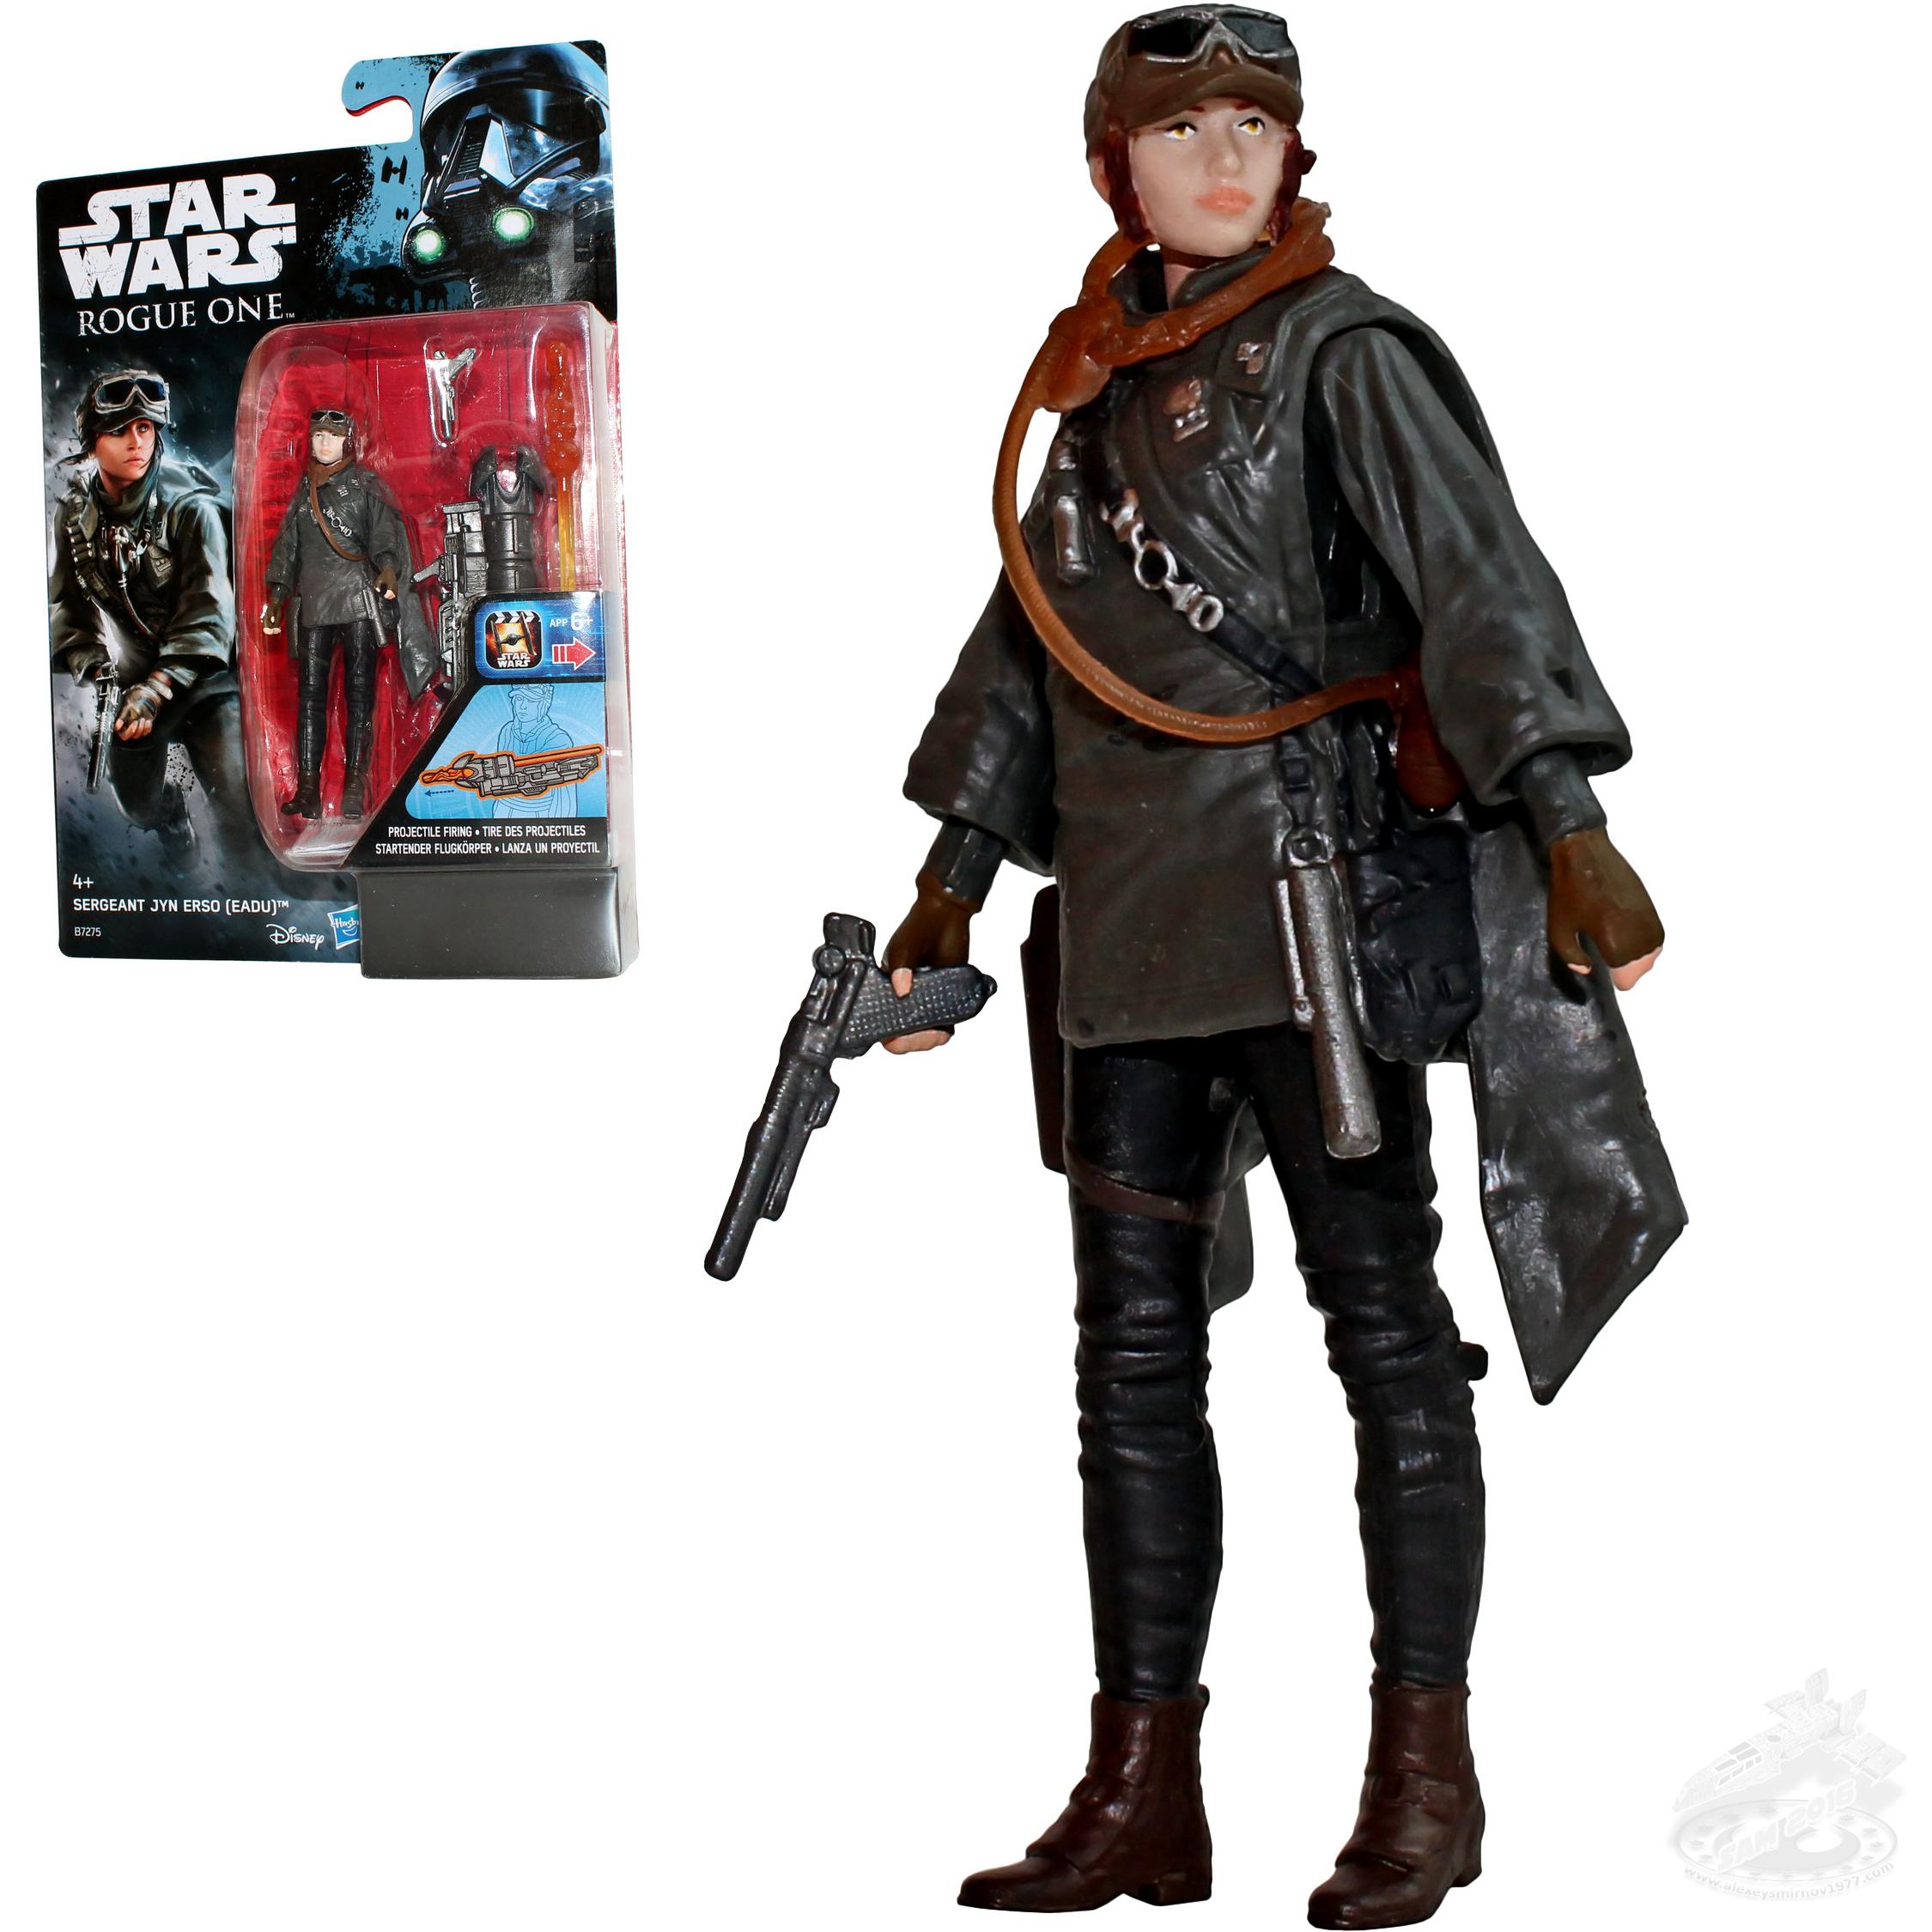 3.75 Inch Action Figure Eadu Star Wars Rogue One Sergeant Jyn Erso